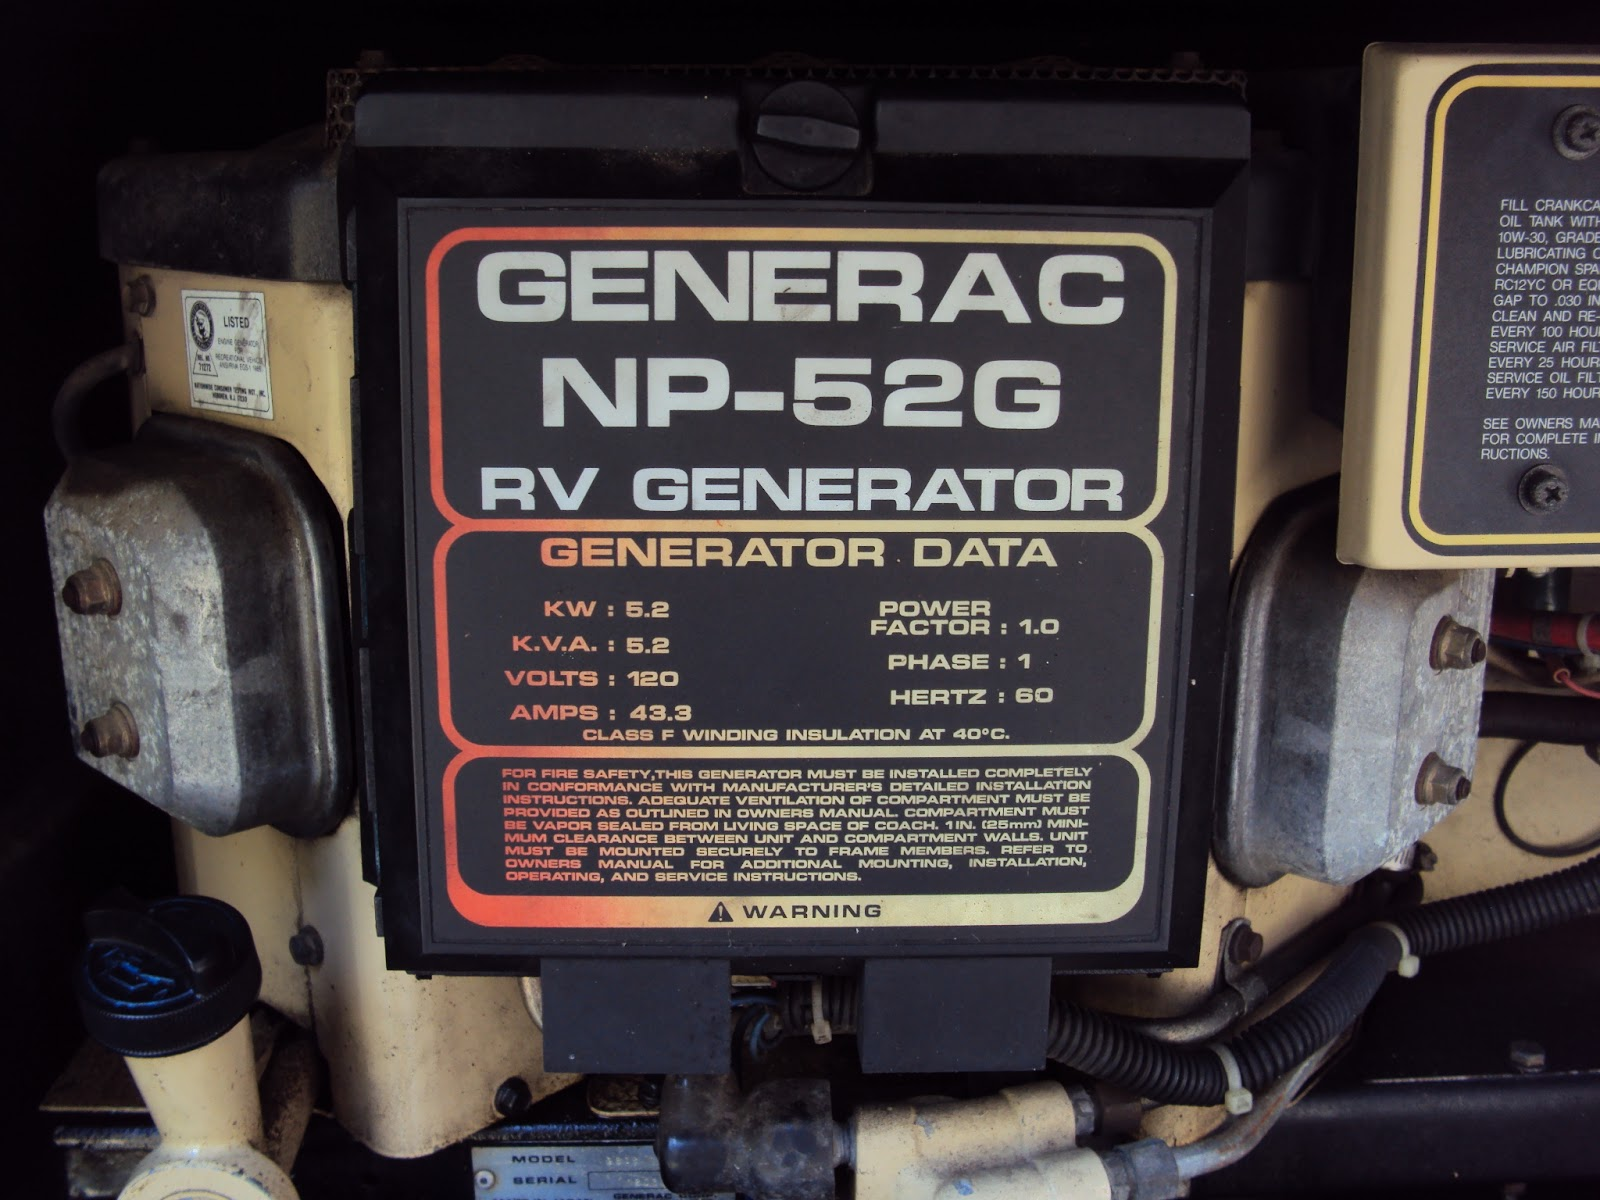 generac rv generator wiring diagram single phase capacitor start run motor np 52g trouble the laptop junction